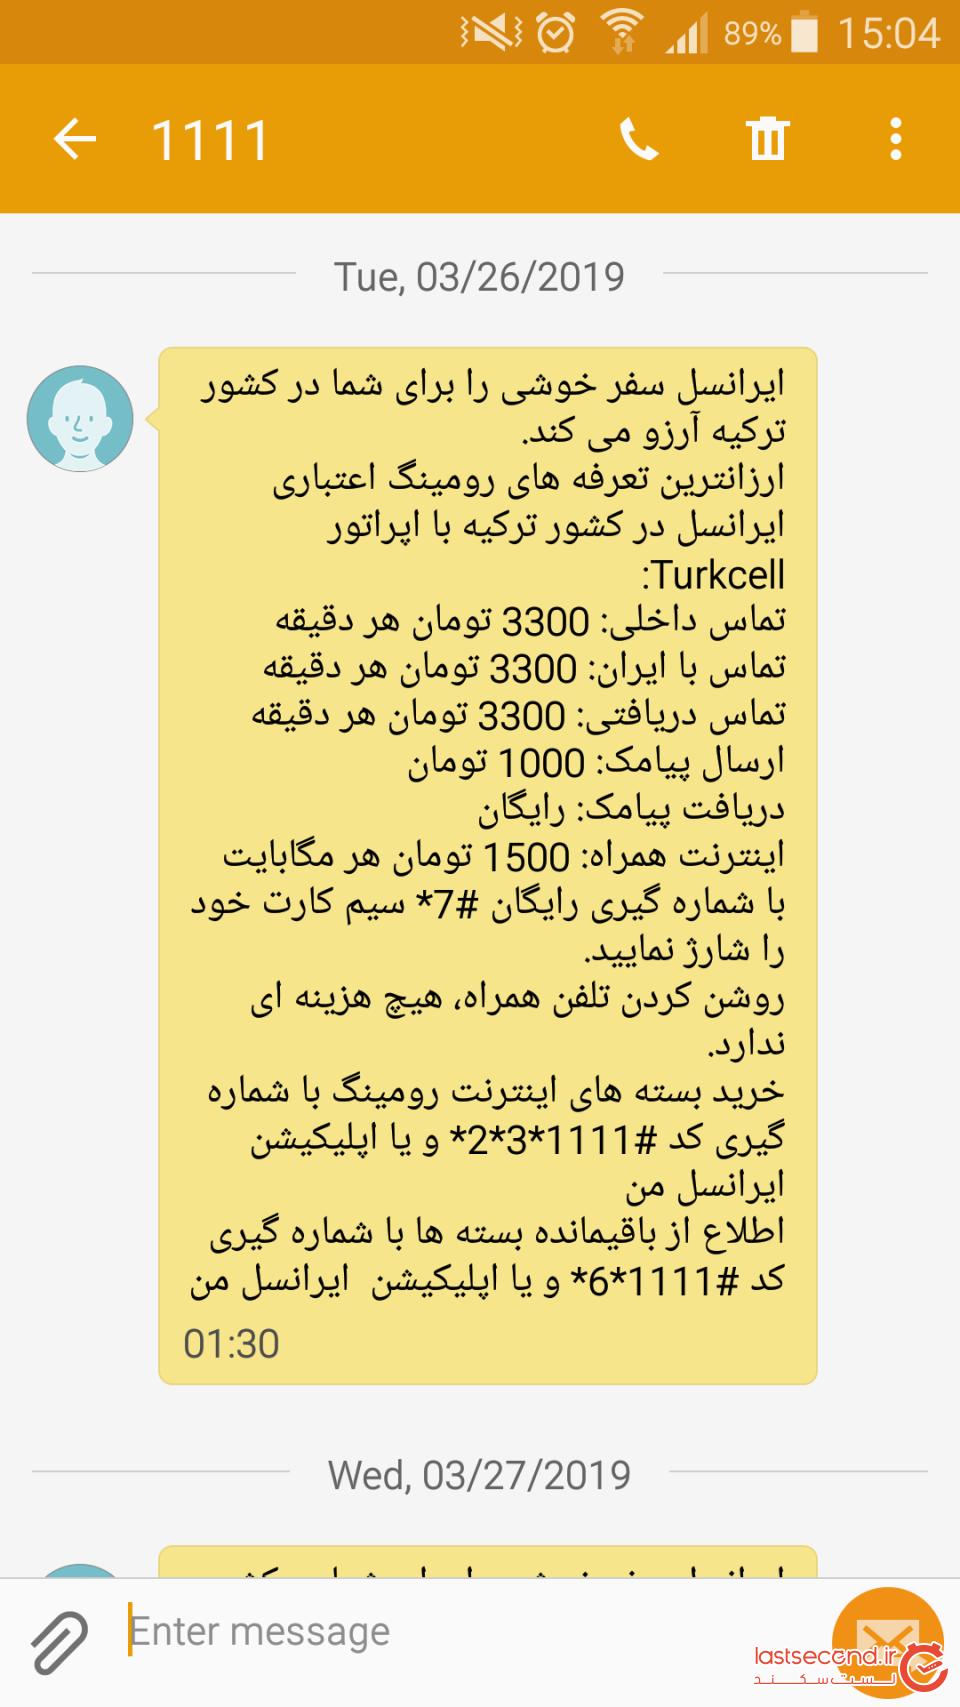 Screenshot_2019-05-05-15-04-27.png